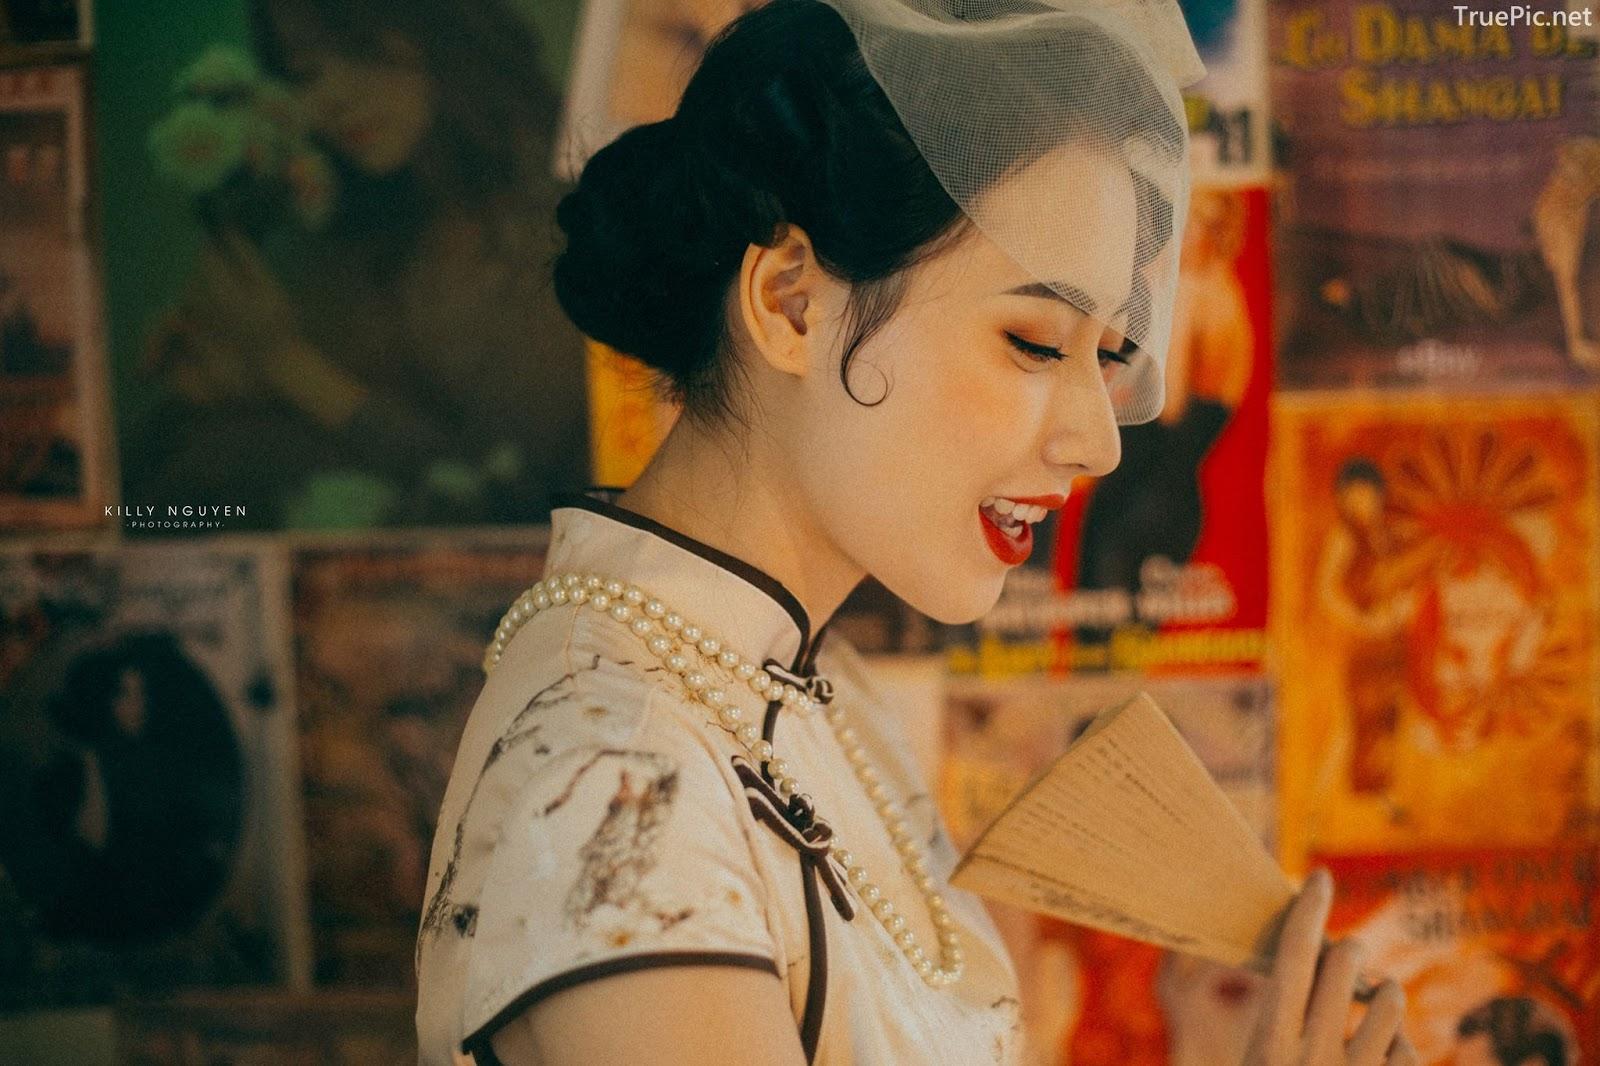 Vietnamese model Lan Huong - Lost in ShangHai - Photo by Killy Nguyen - TruePic.net - Picture 5